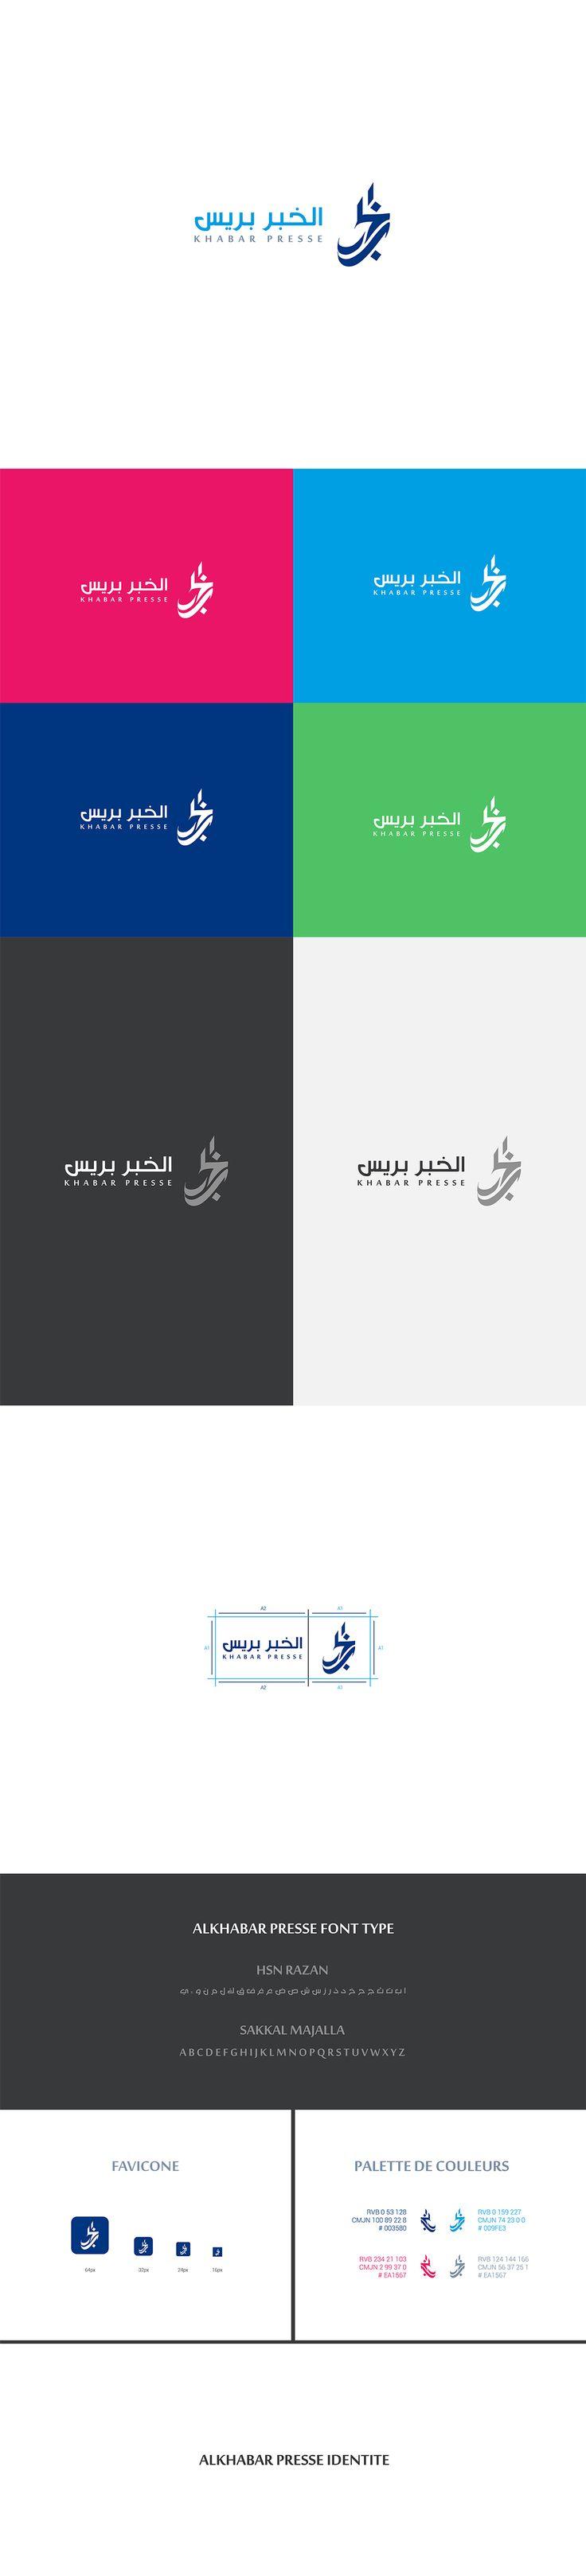 ALKHABAR PRESSE Branding Identity on Pantone Canvas Gallery